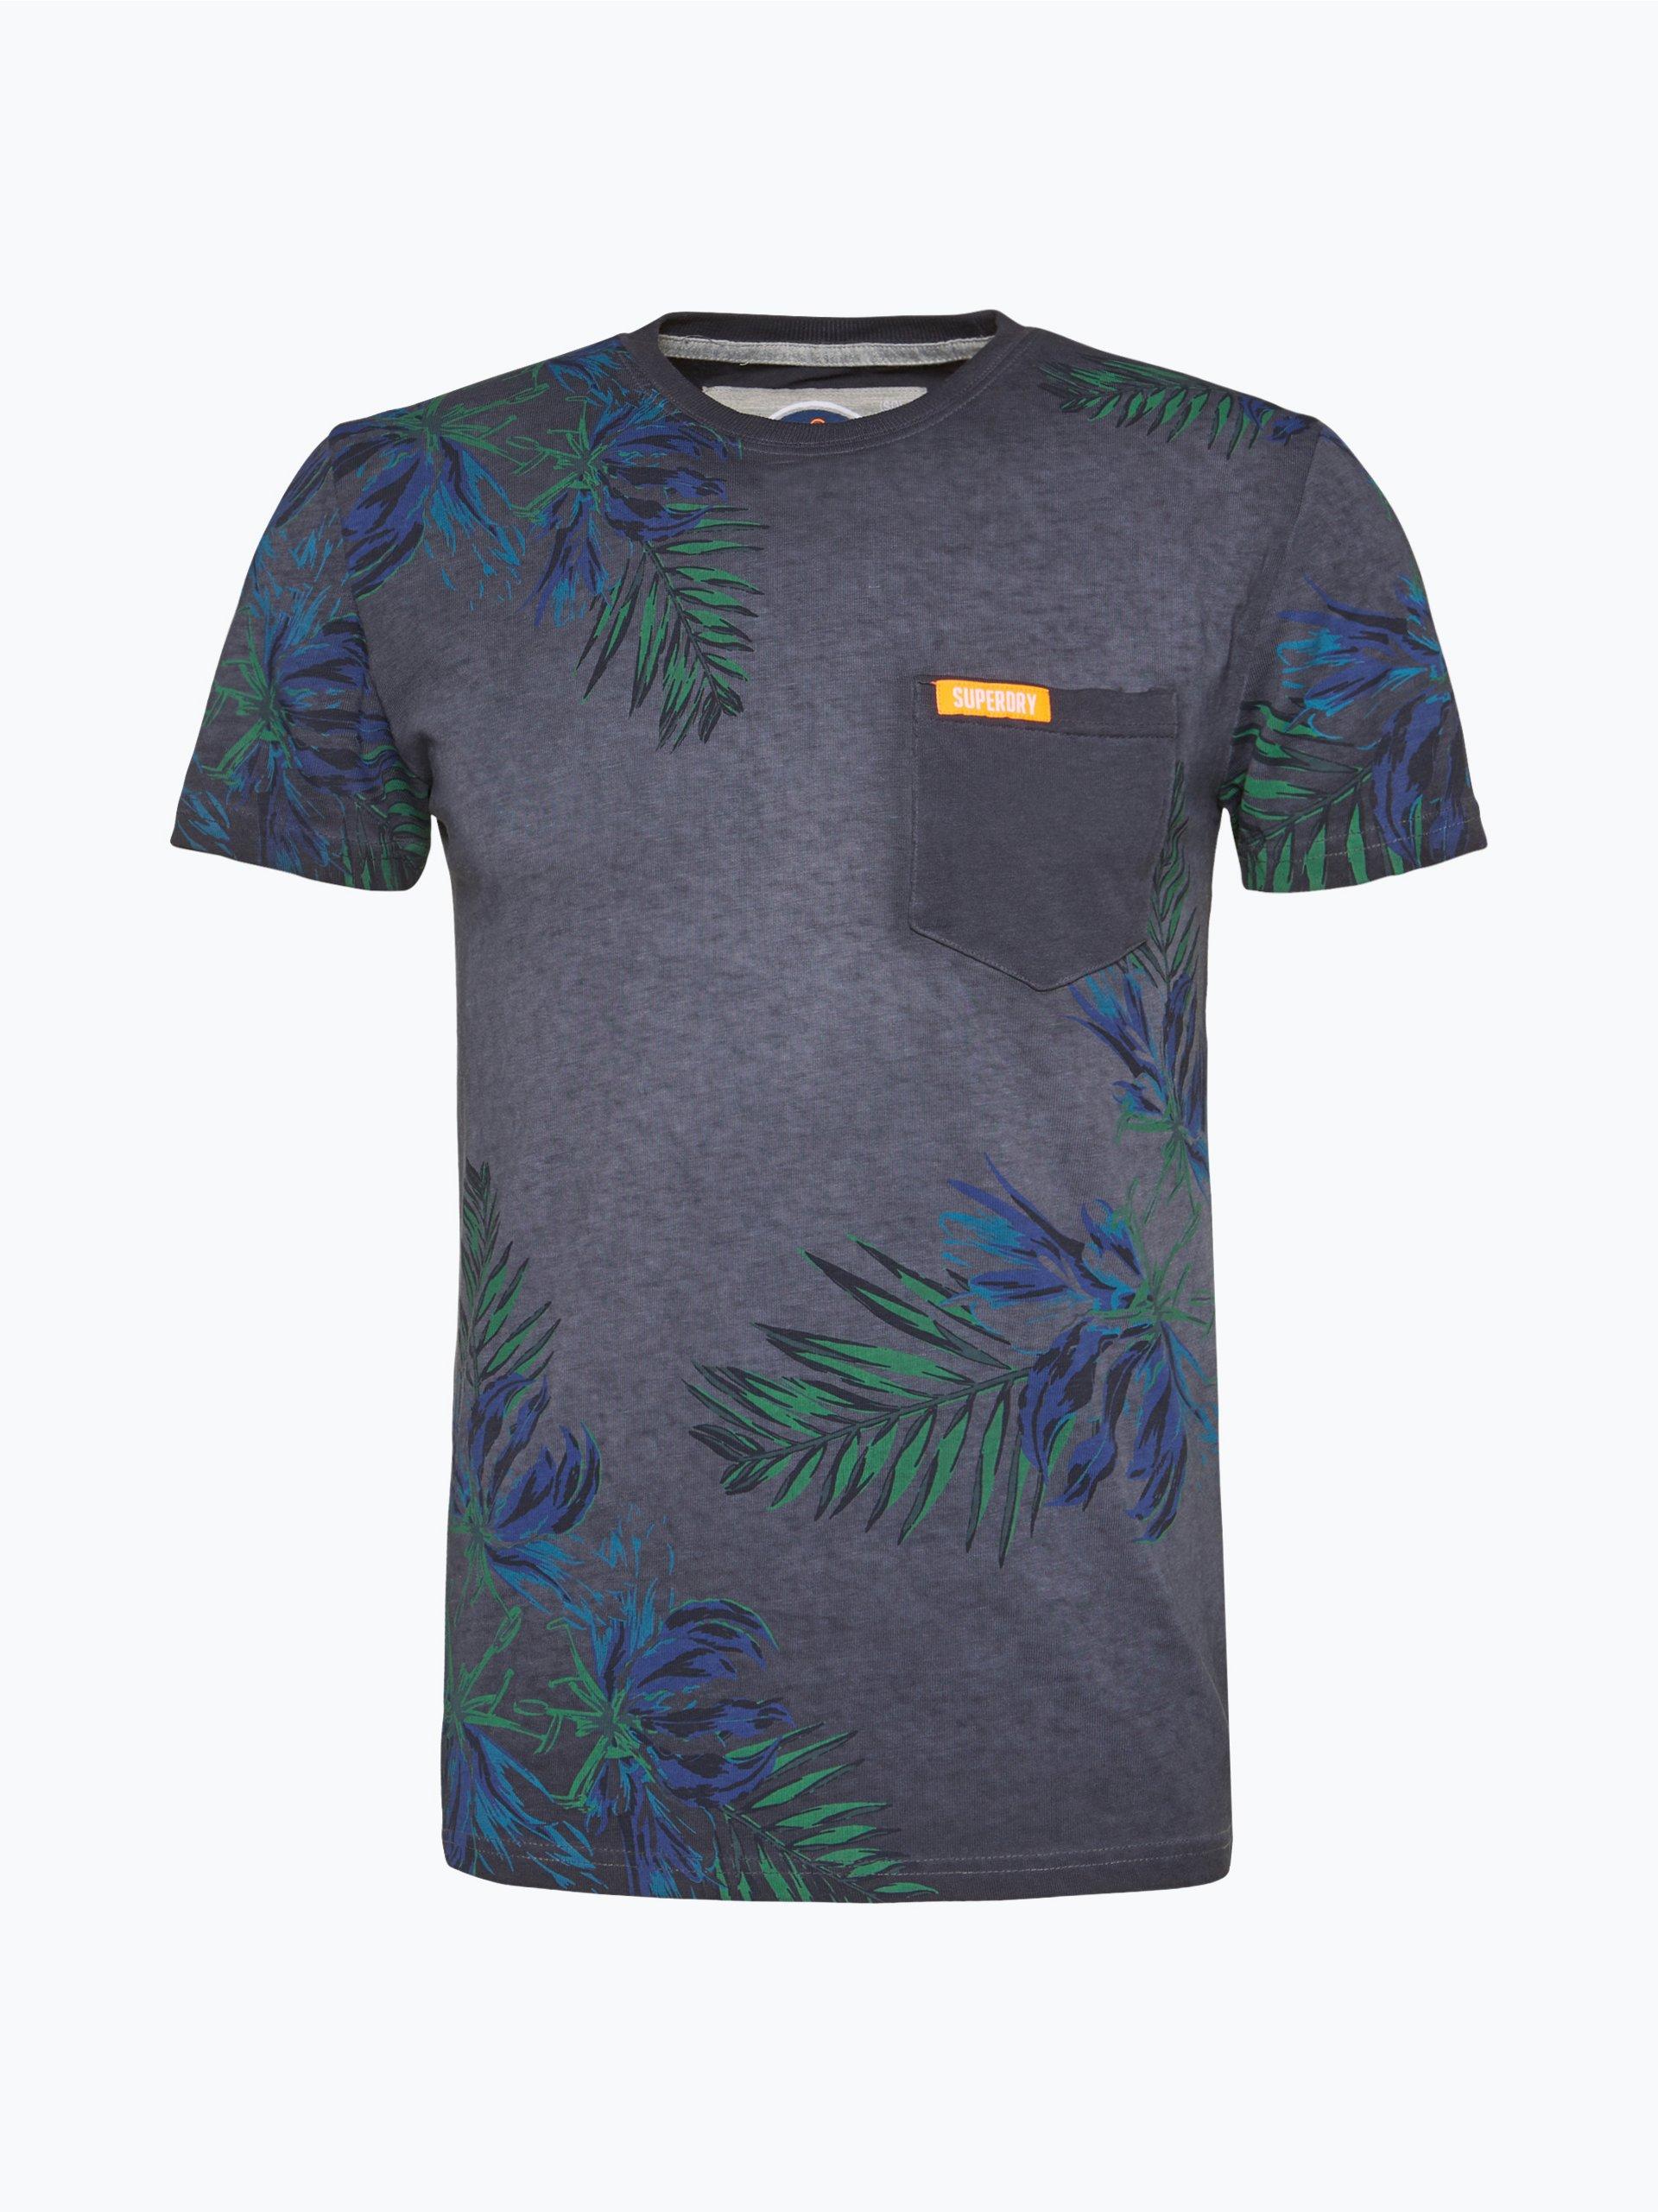 superdry herren t shirt marine gemustert online kaufen vangraaf com. Black Bedroom Furniture Sets. Home Design Ideas